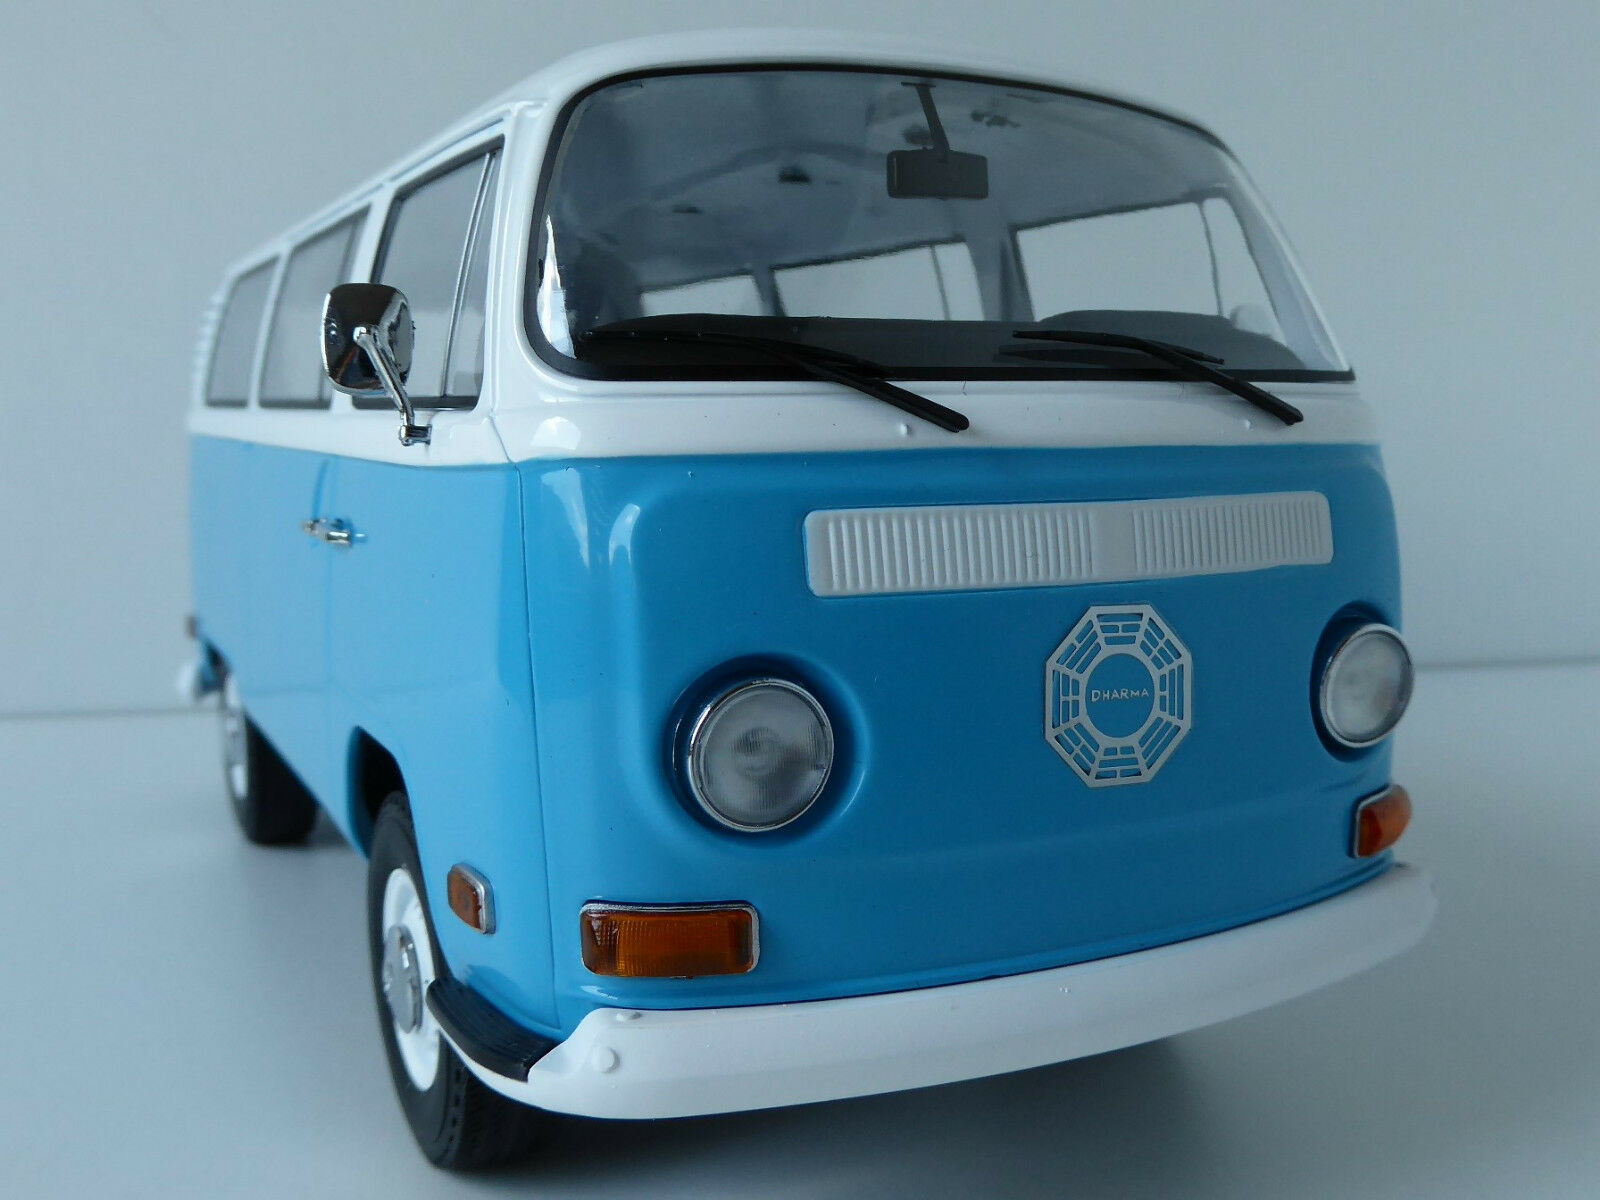 Vw t2 Bus Lost TV Series Dharma 1971 1 18 Artisan vertlight 19011 Volkswagen